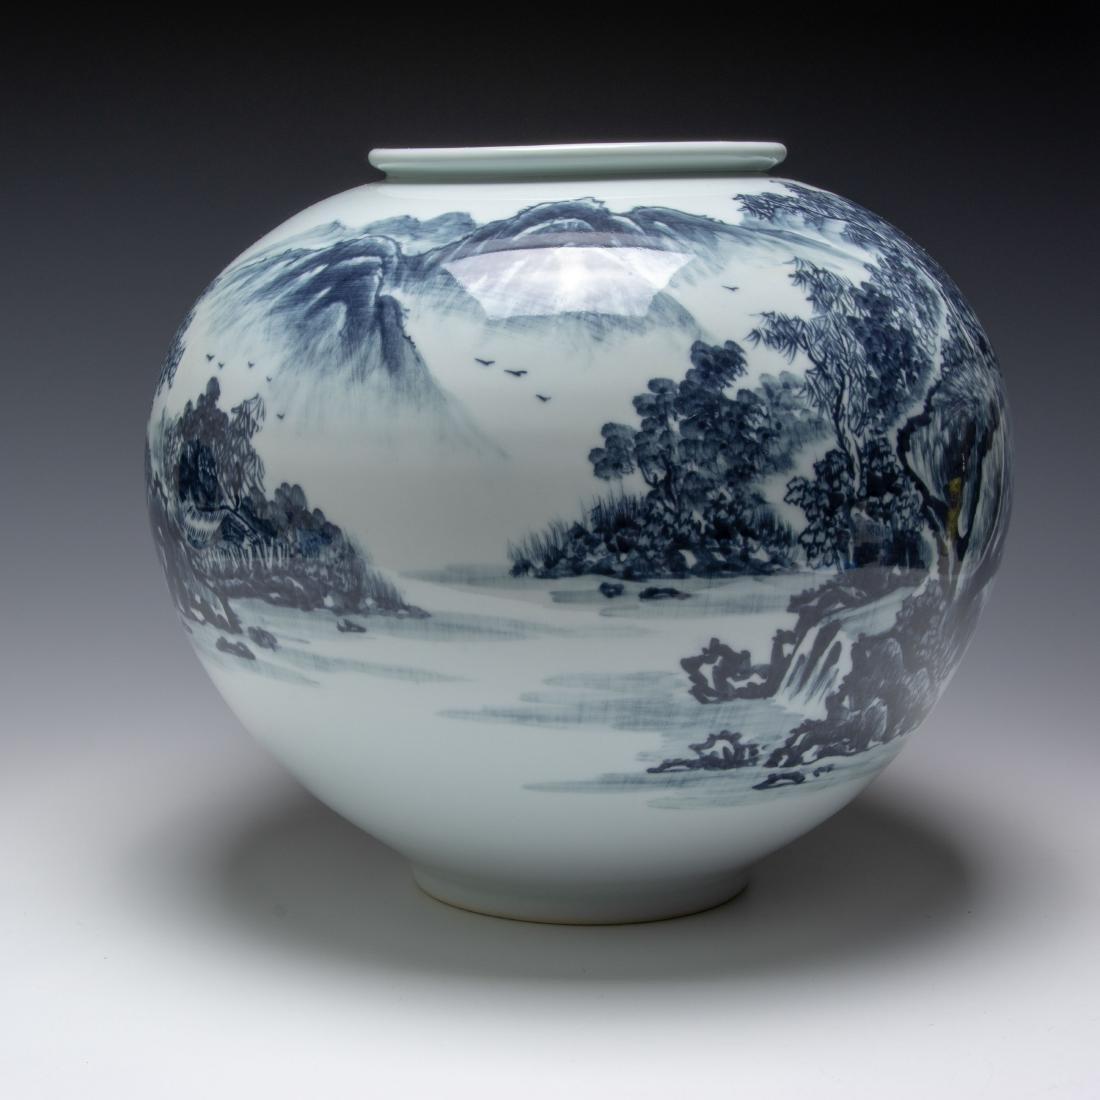 Blue & White Korean Vase w/ Dedication, 1992 - 2